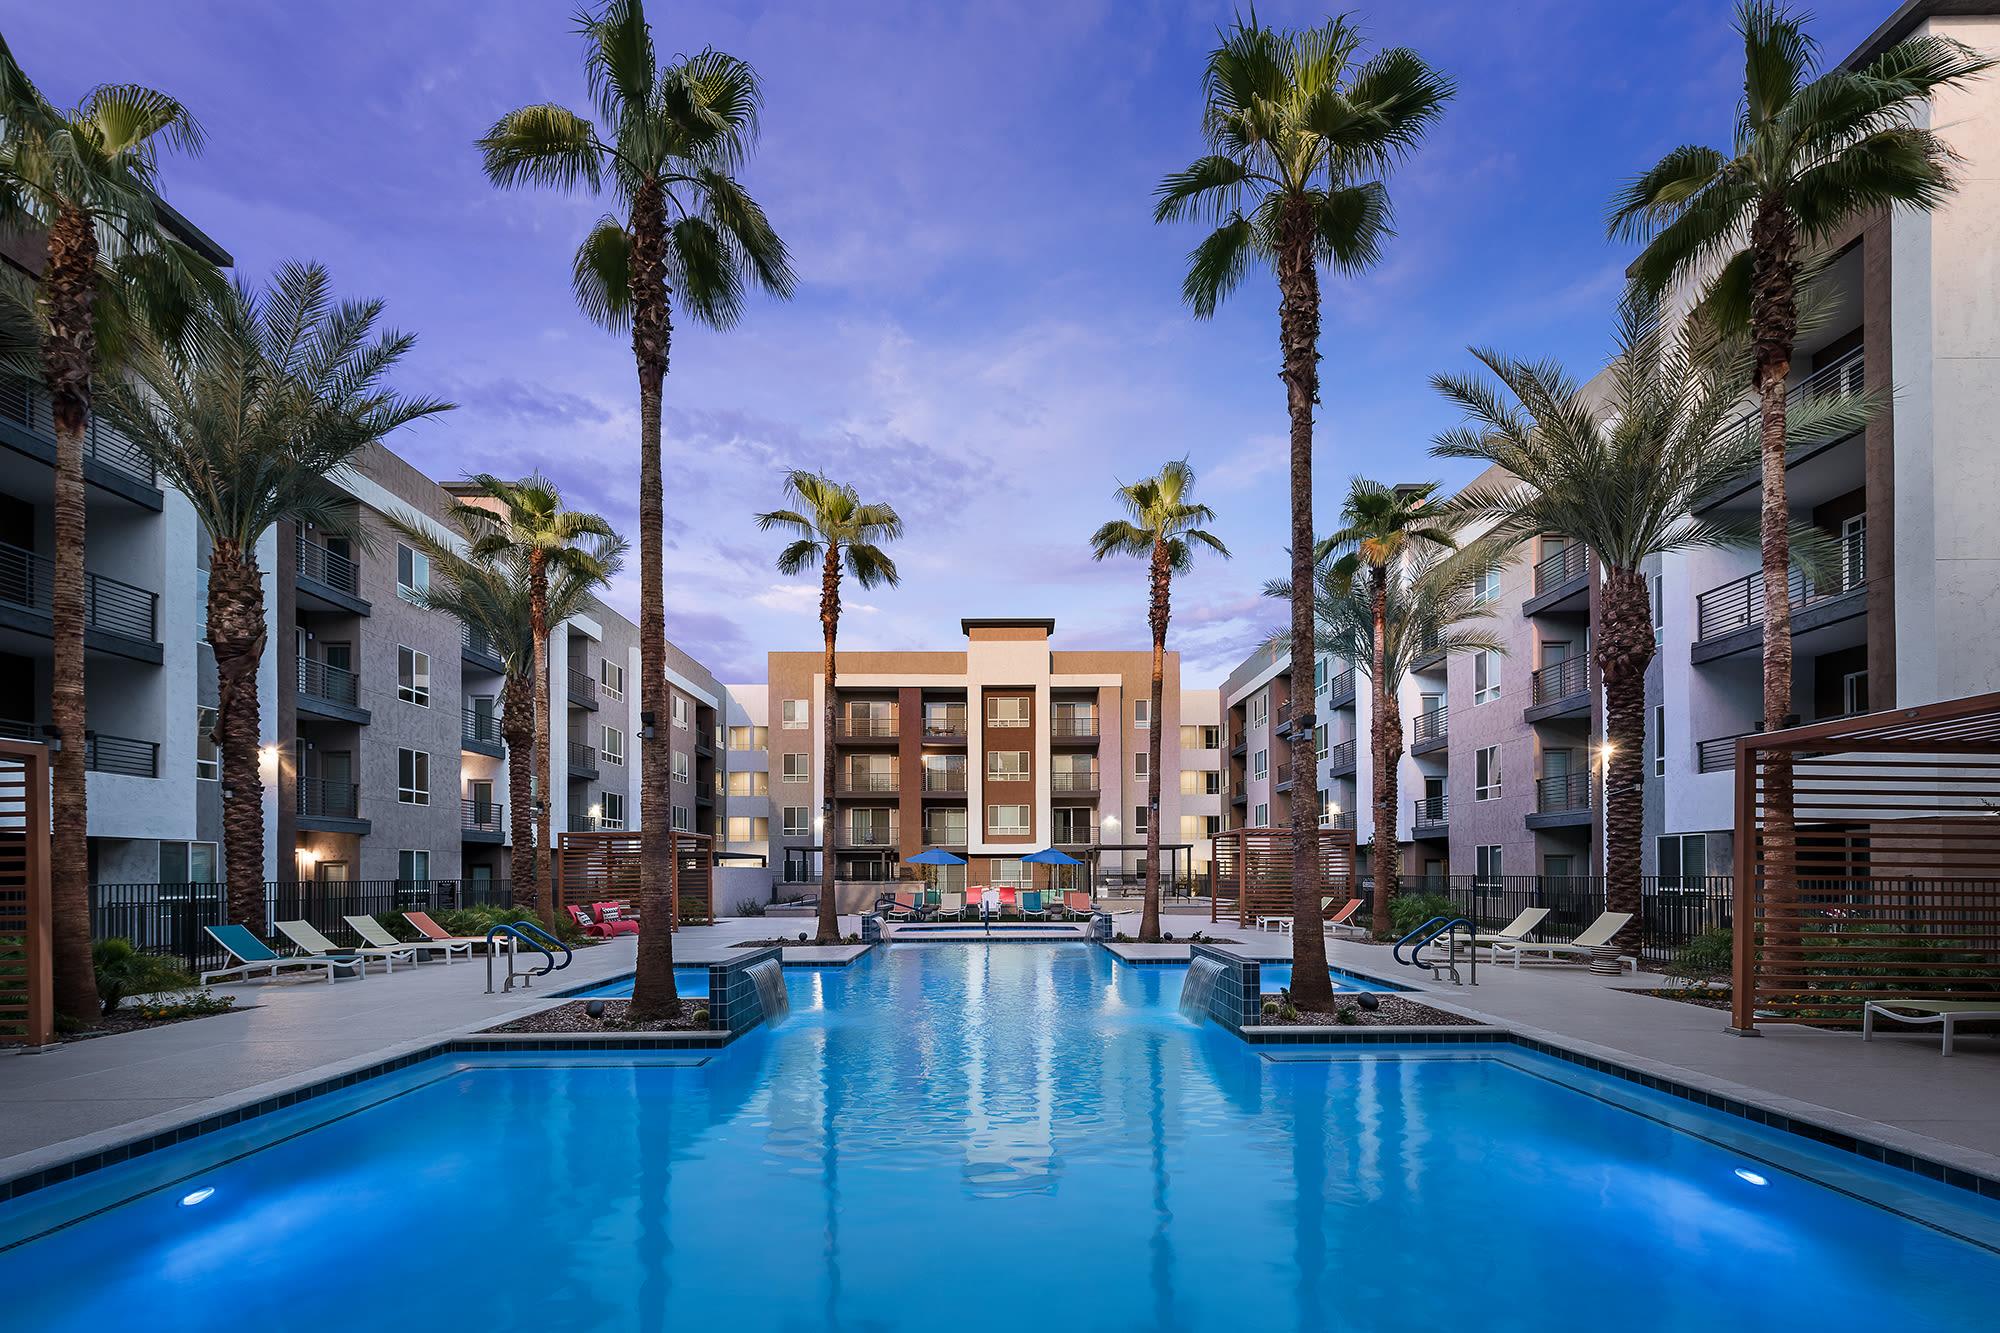 Contact us at ArLo in Phoenix, Arizona